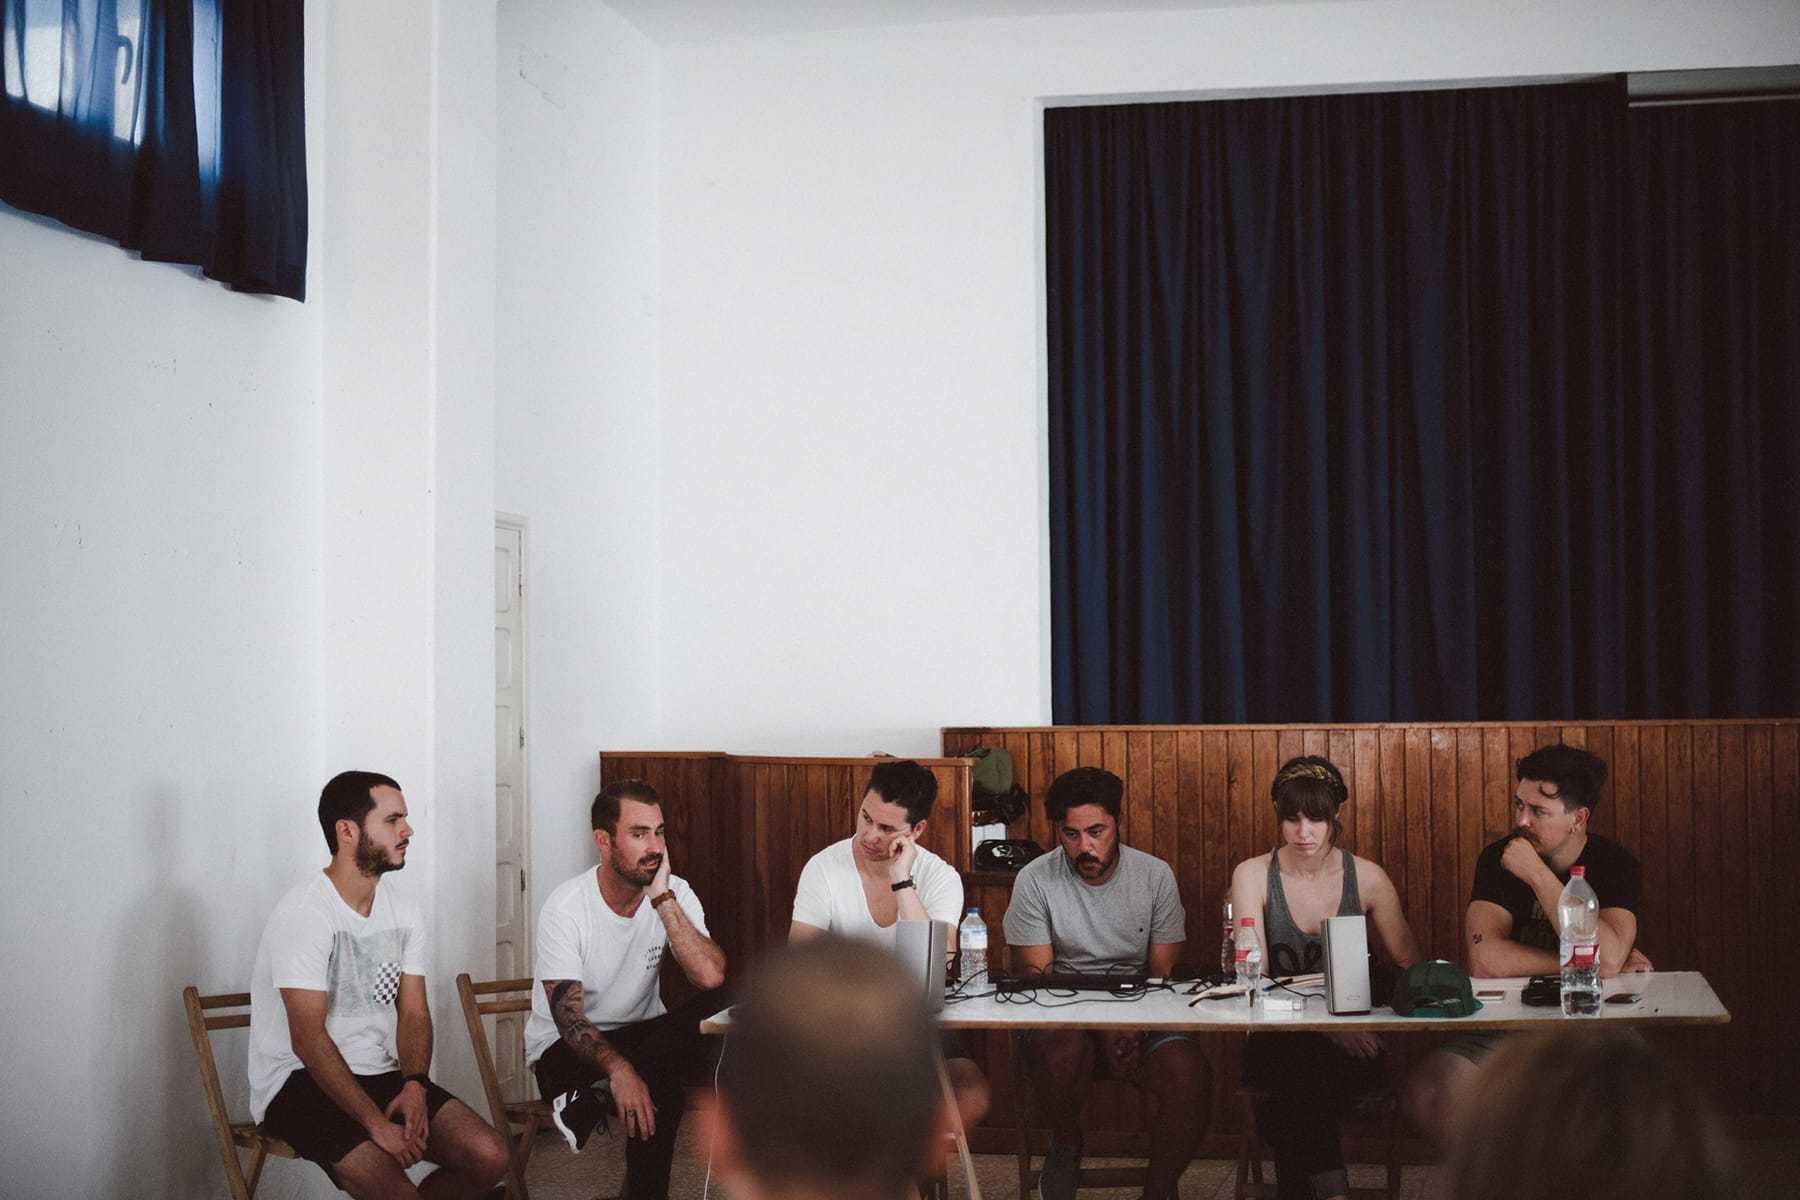 wolves_workshop_hilario_sanchez_fotografo_boda_españa_193